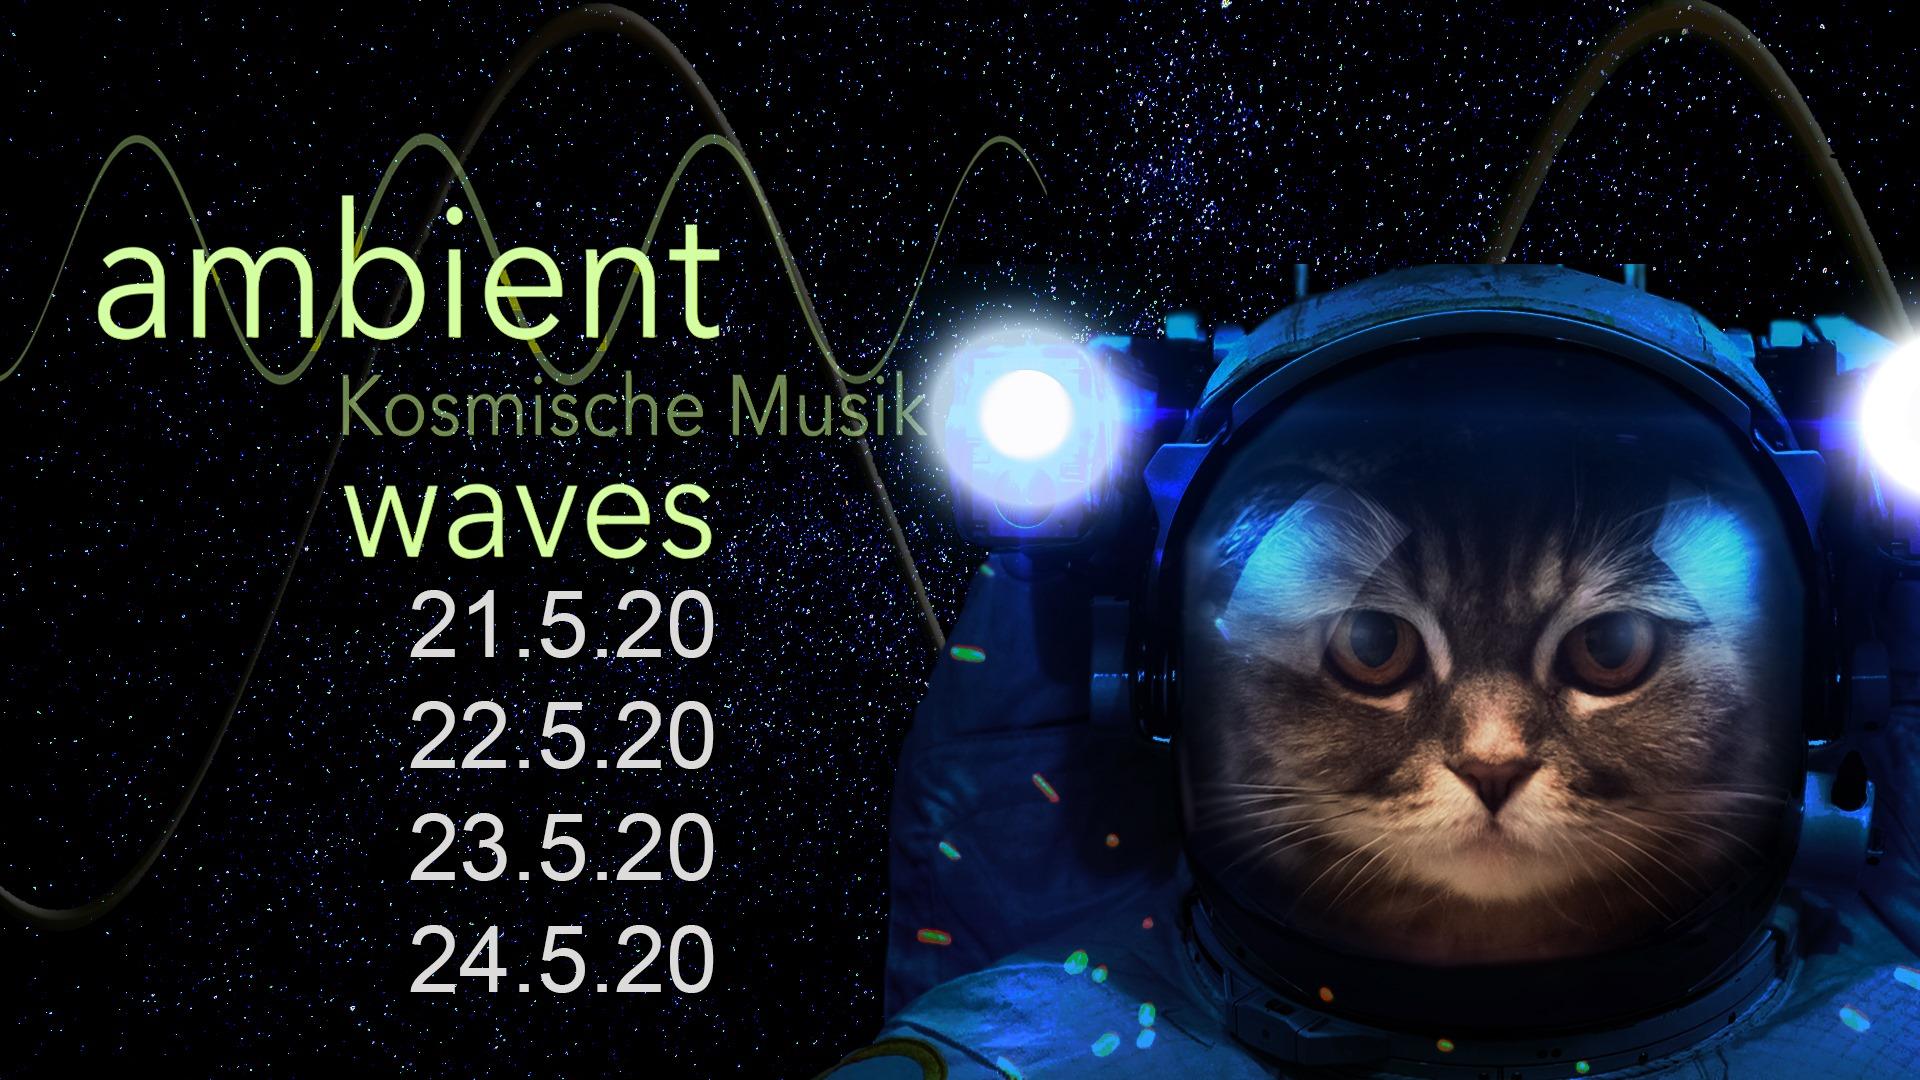 Ambient Waves Festival München